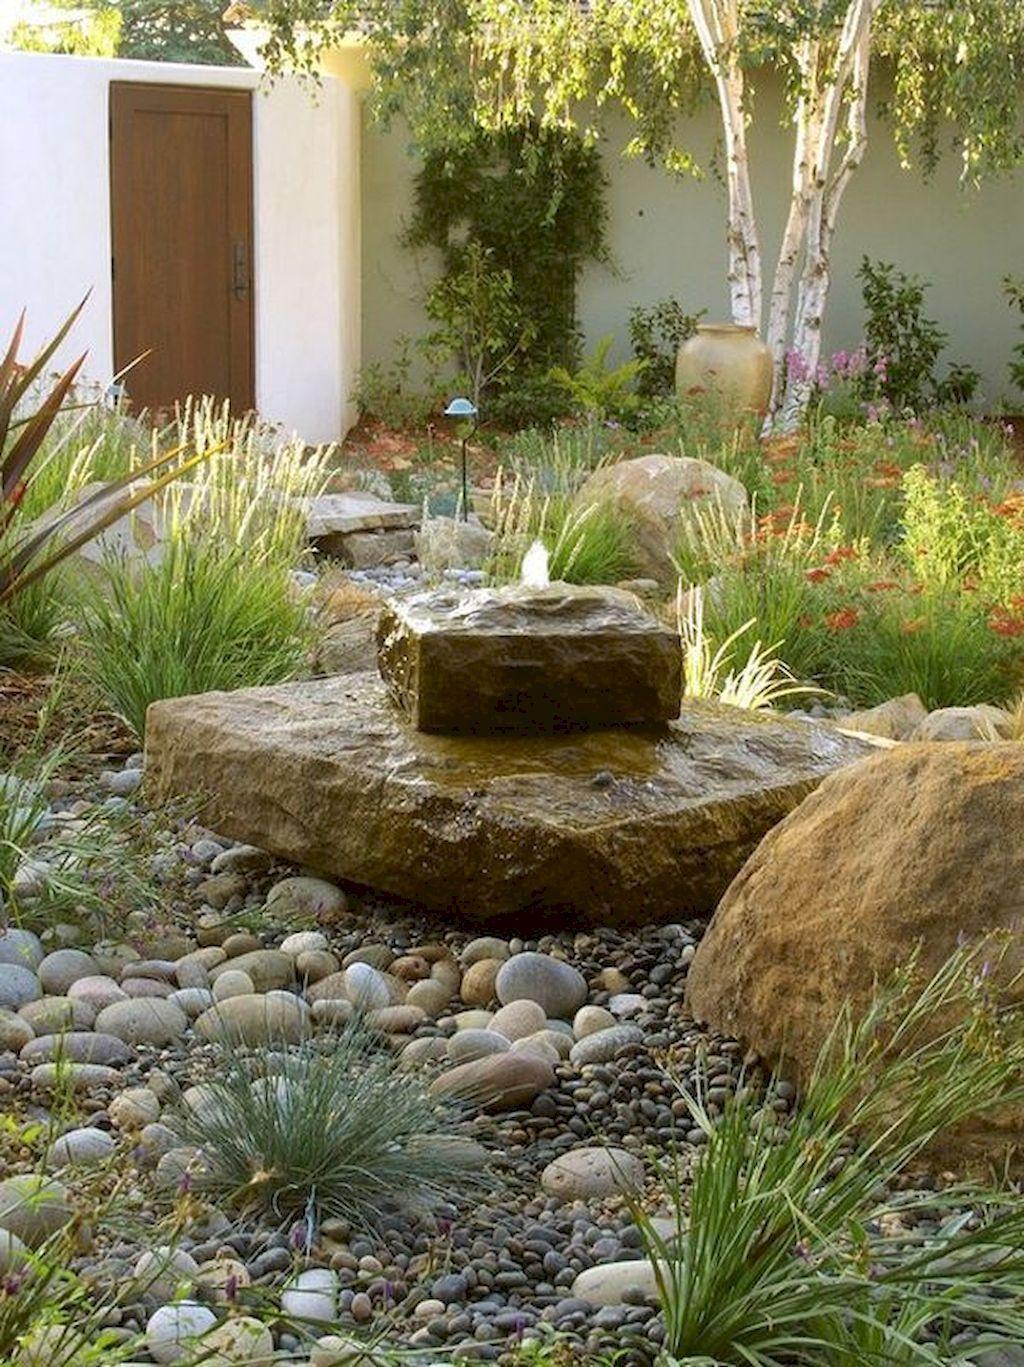 Gorgeous 75 Stunning Front Yard Rock Garden Landscaping Ideas Https Roomodeling Com 7 Rock Garden Design Rock Garden Landscaping Water Features In The Garden